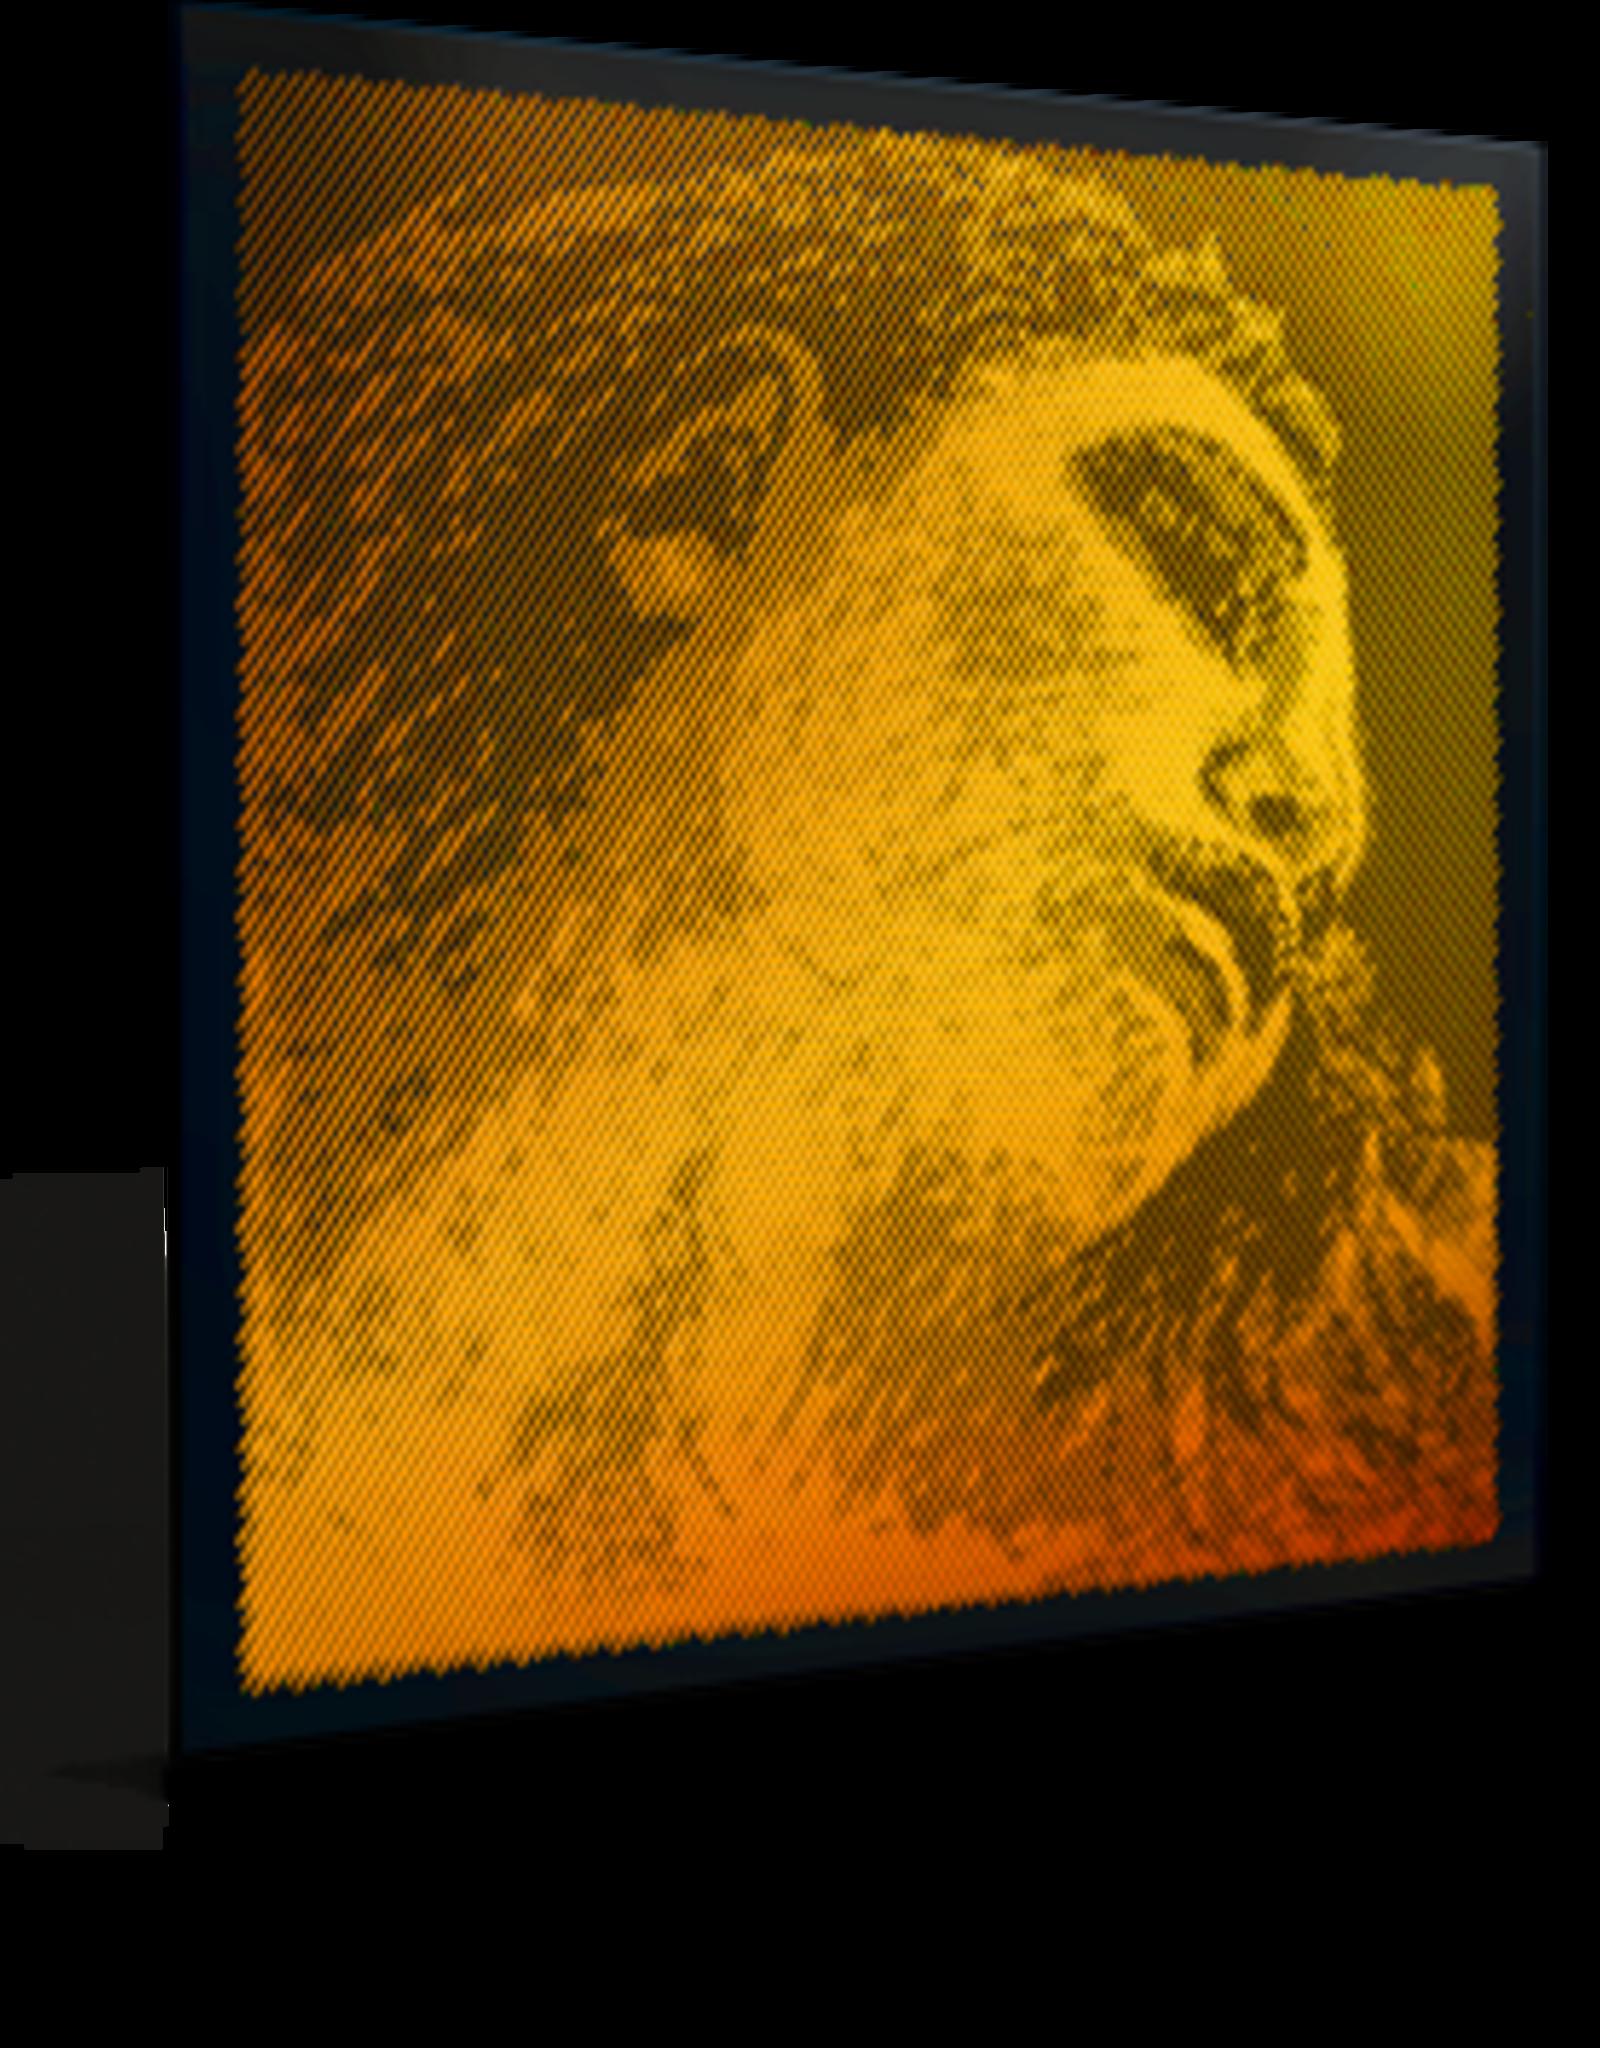 PIRASTRO Evah Pirazzi Gold vioolsnaren set, 4/4